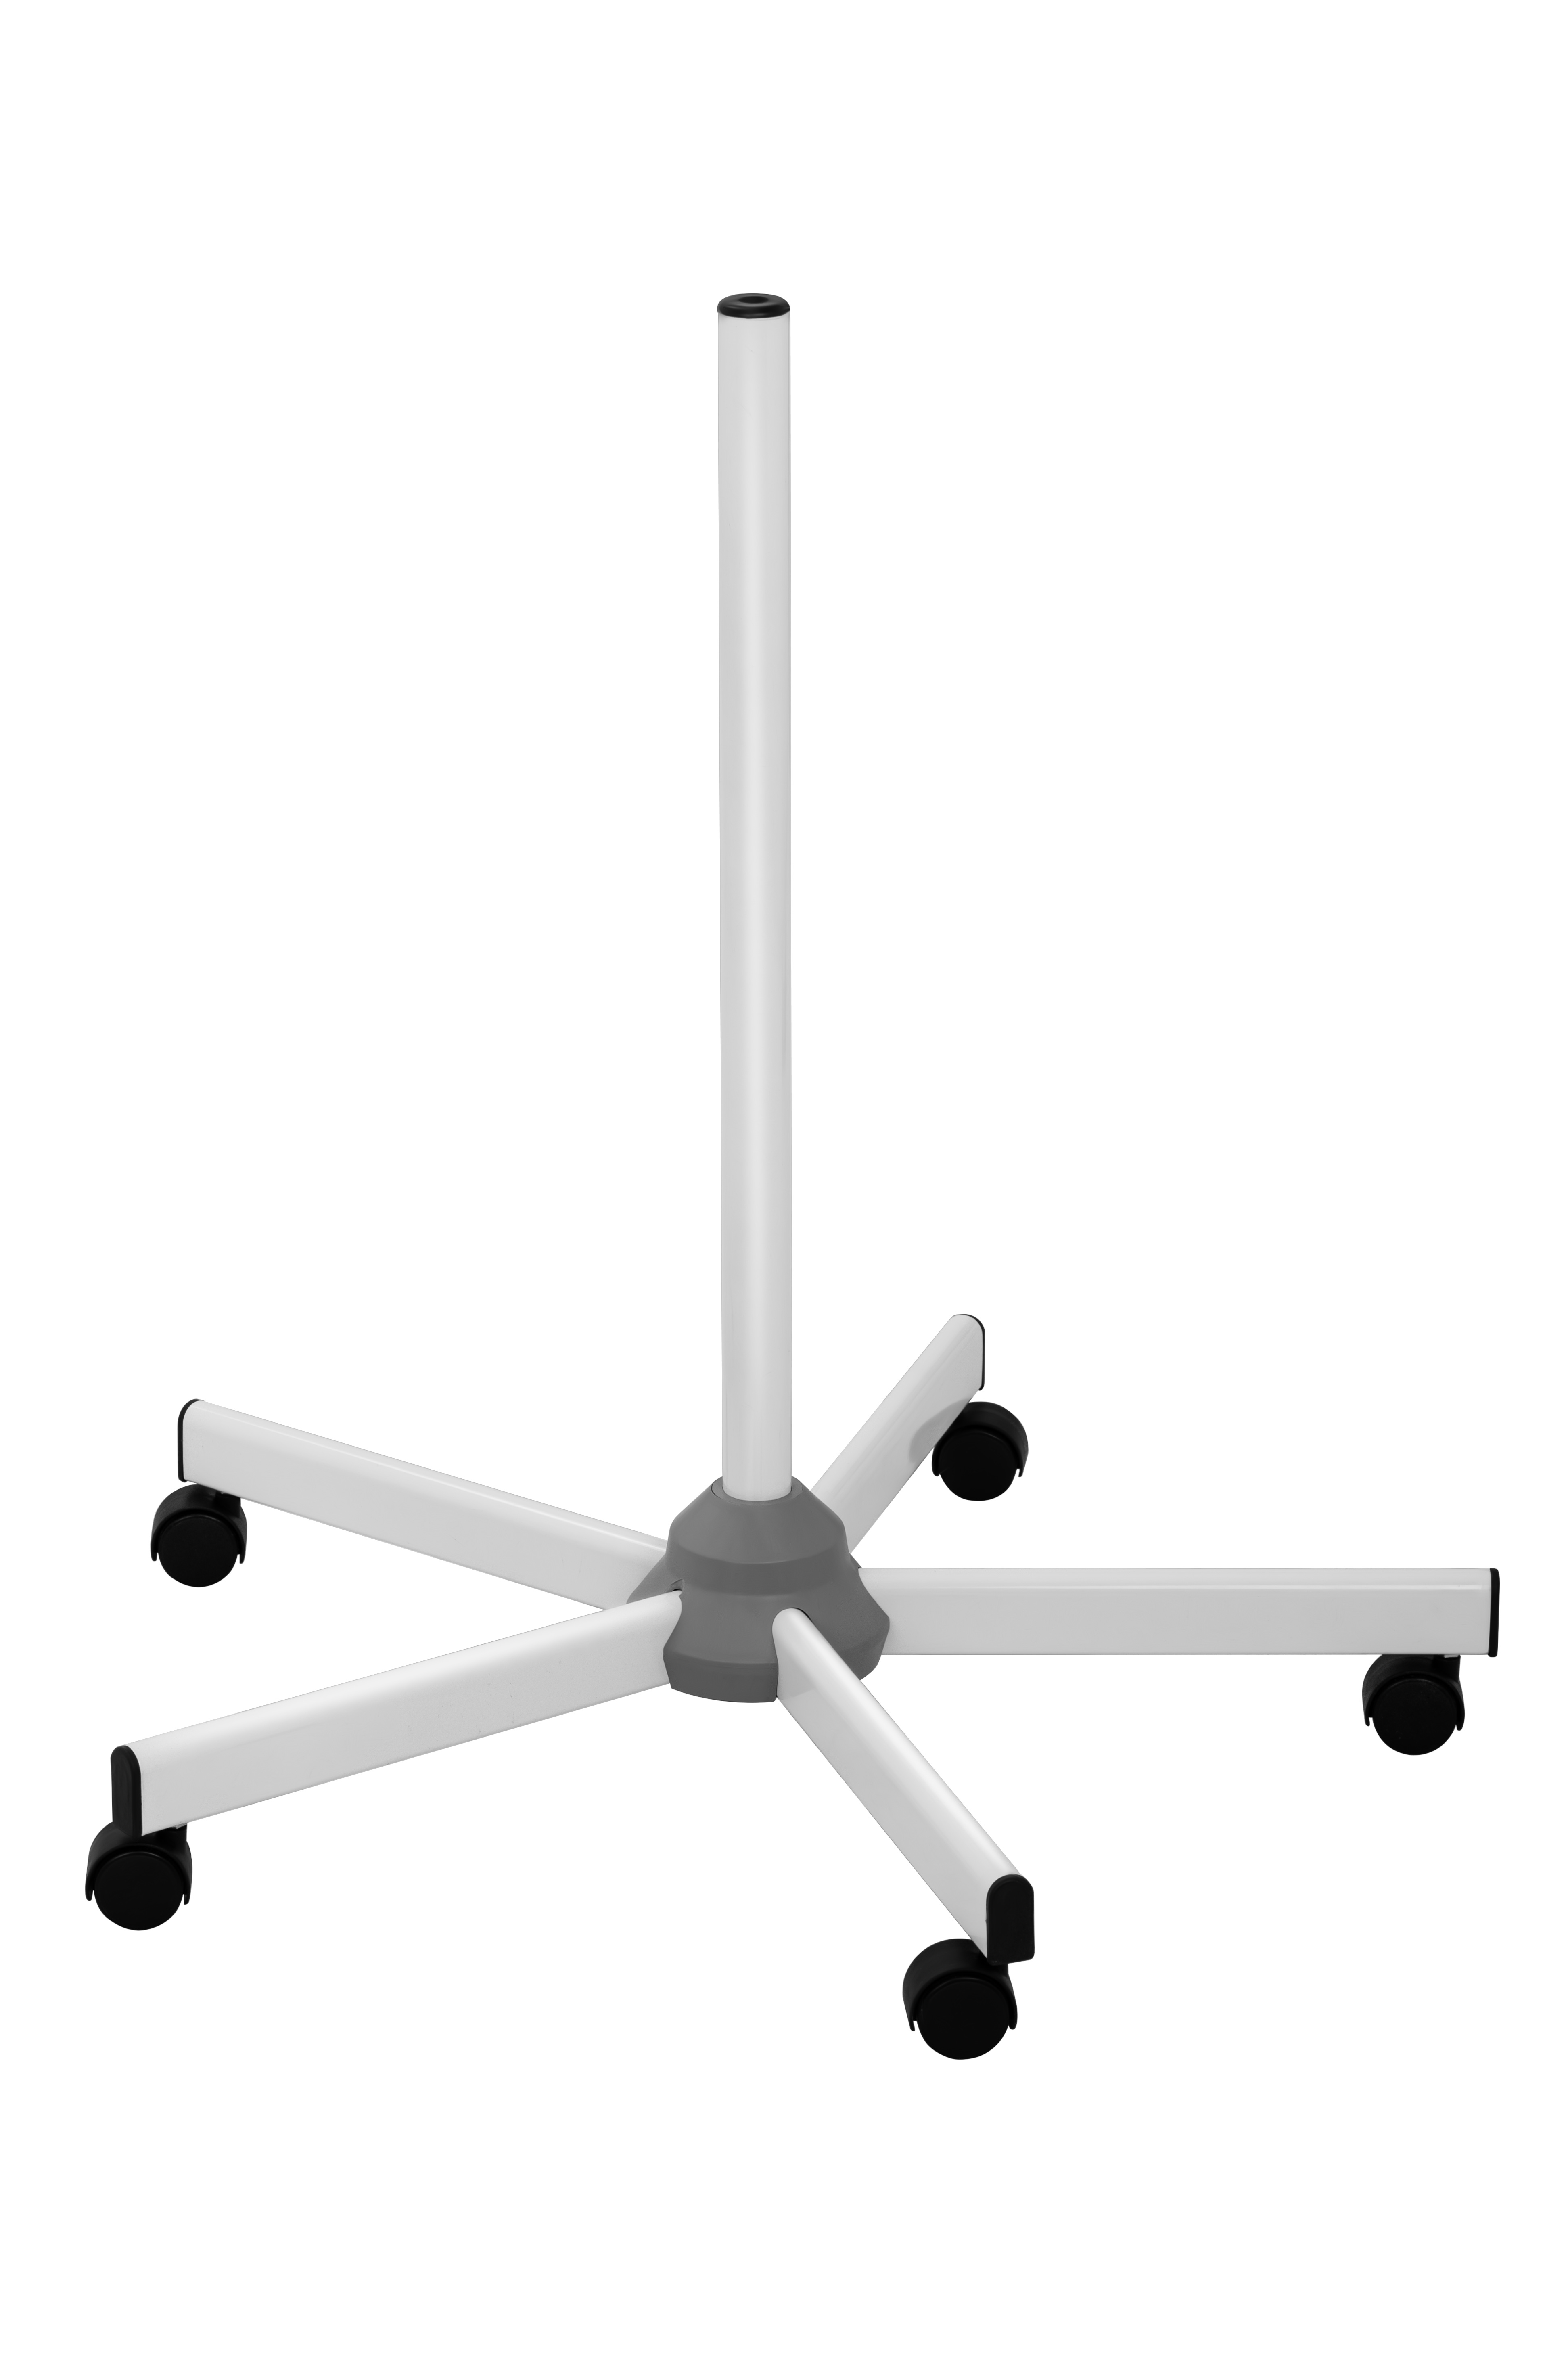 physa Stativ für Lupenleuchte PHY-5ML-1 & PHY-3ML-1 10040202